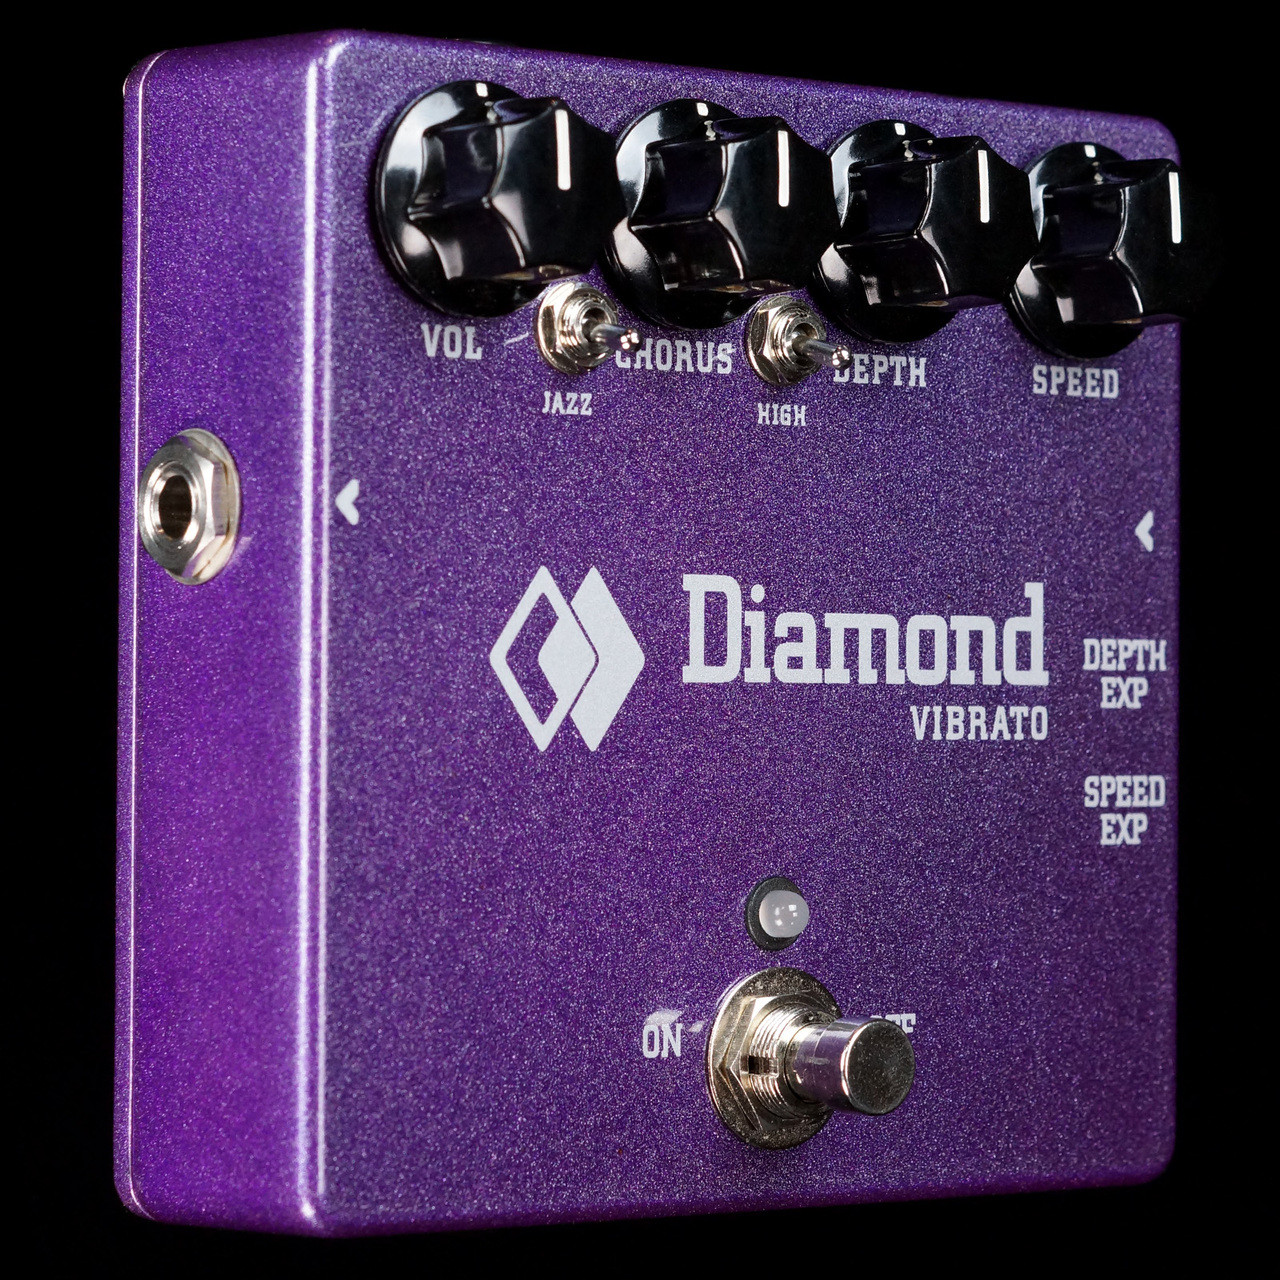 Diamond Analog Vibrato VIB1 2